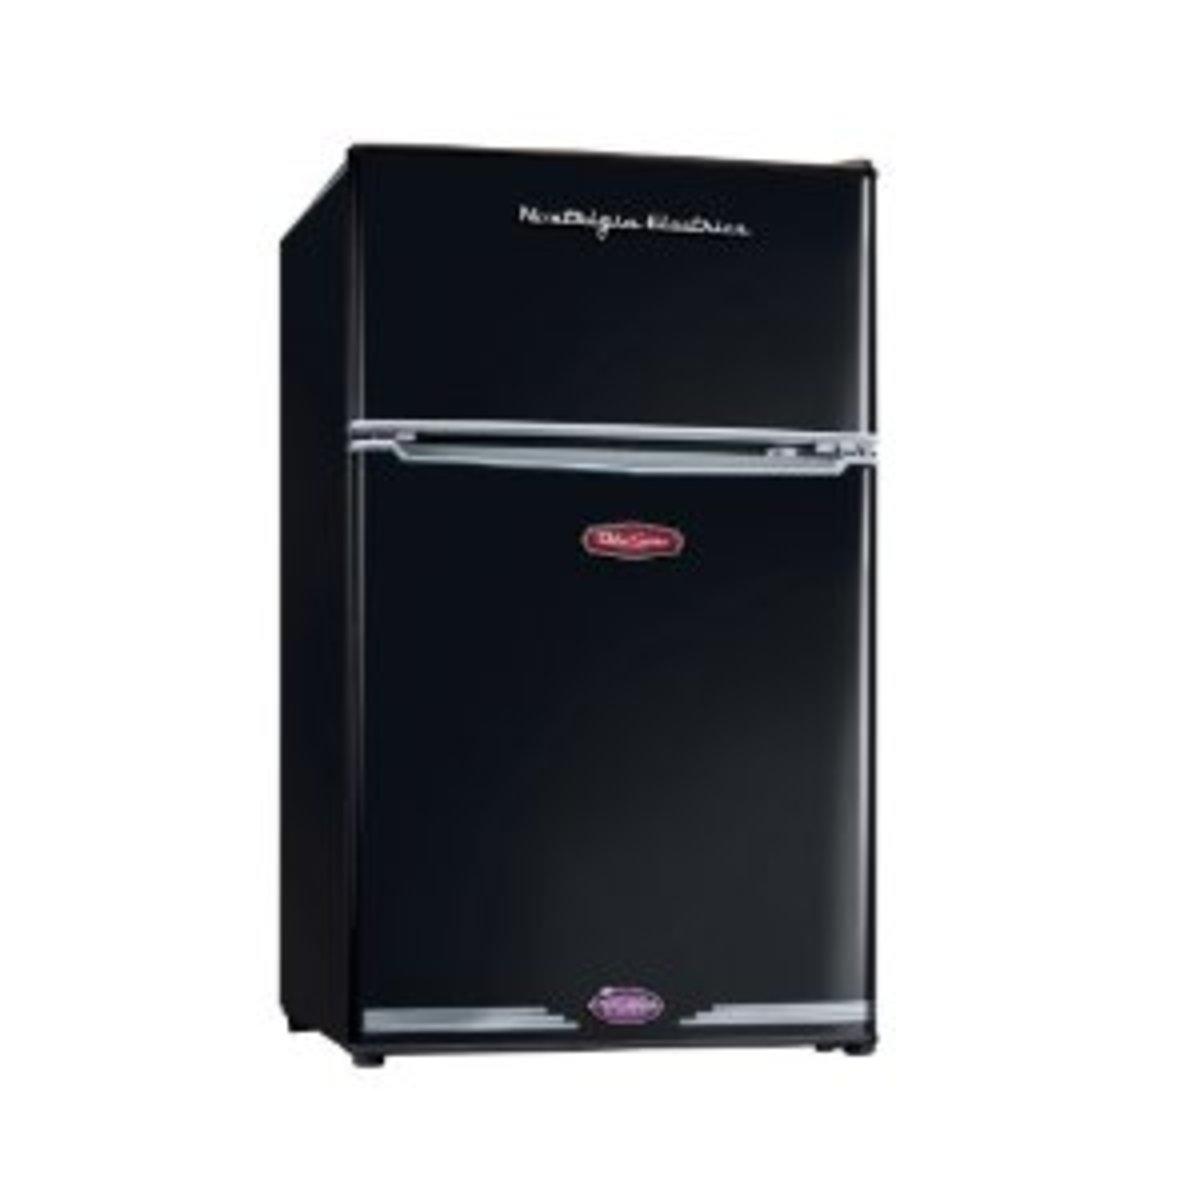 Nostalgia Electrics compact fridge